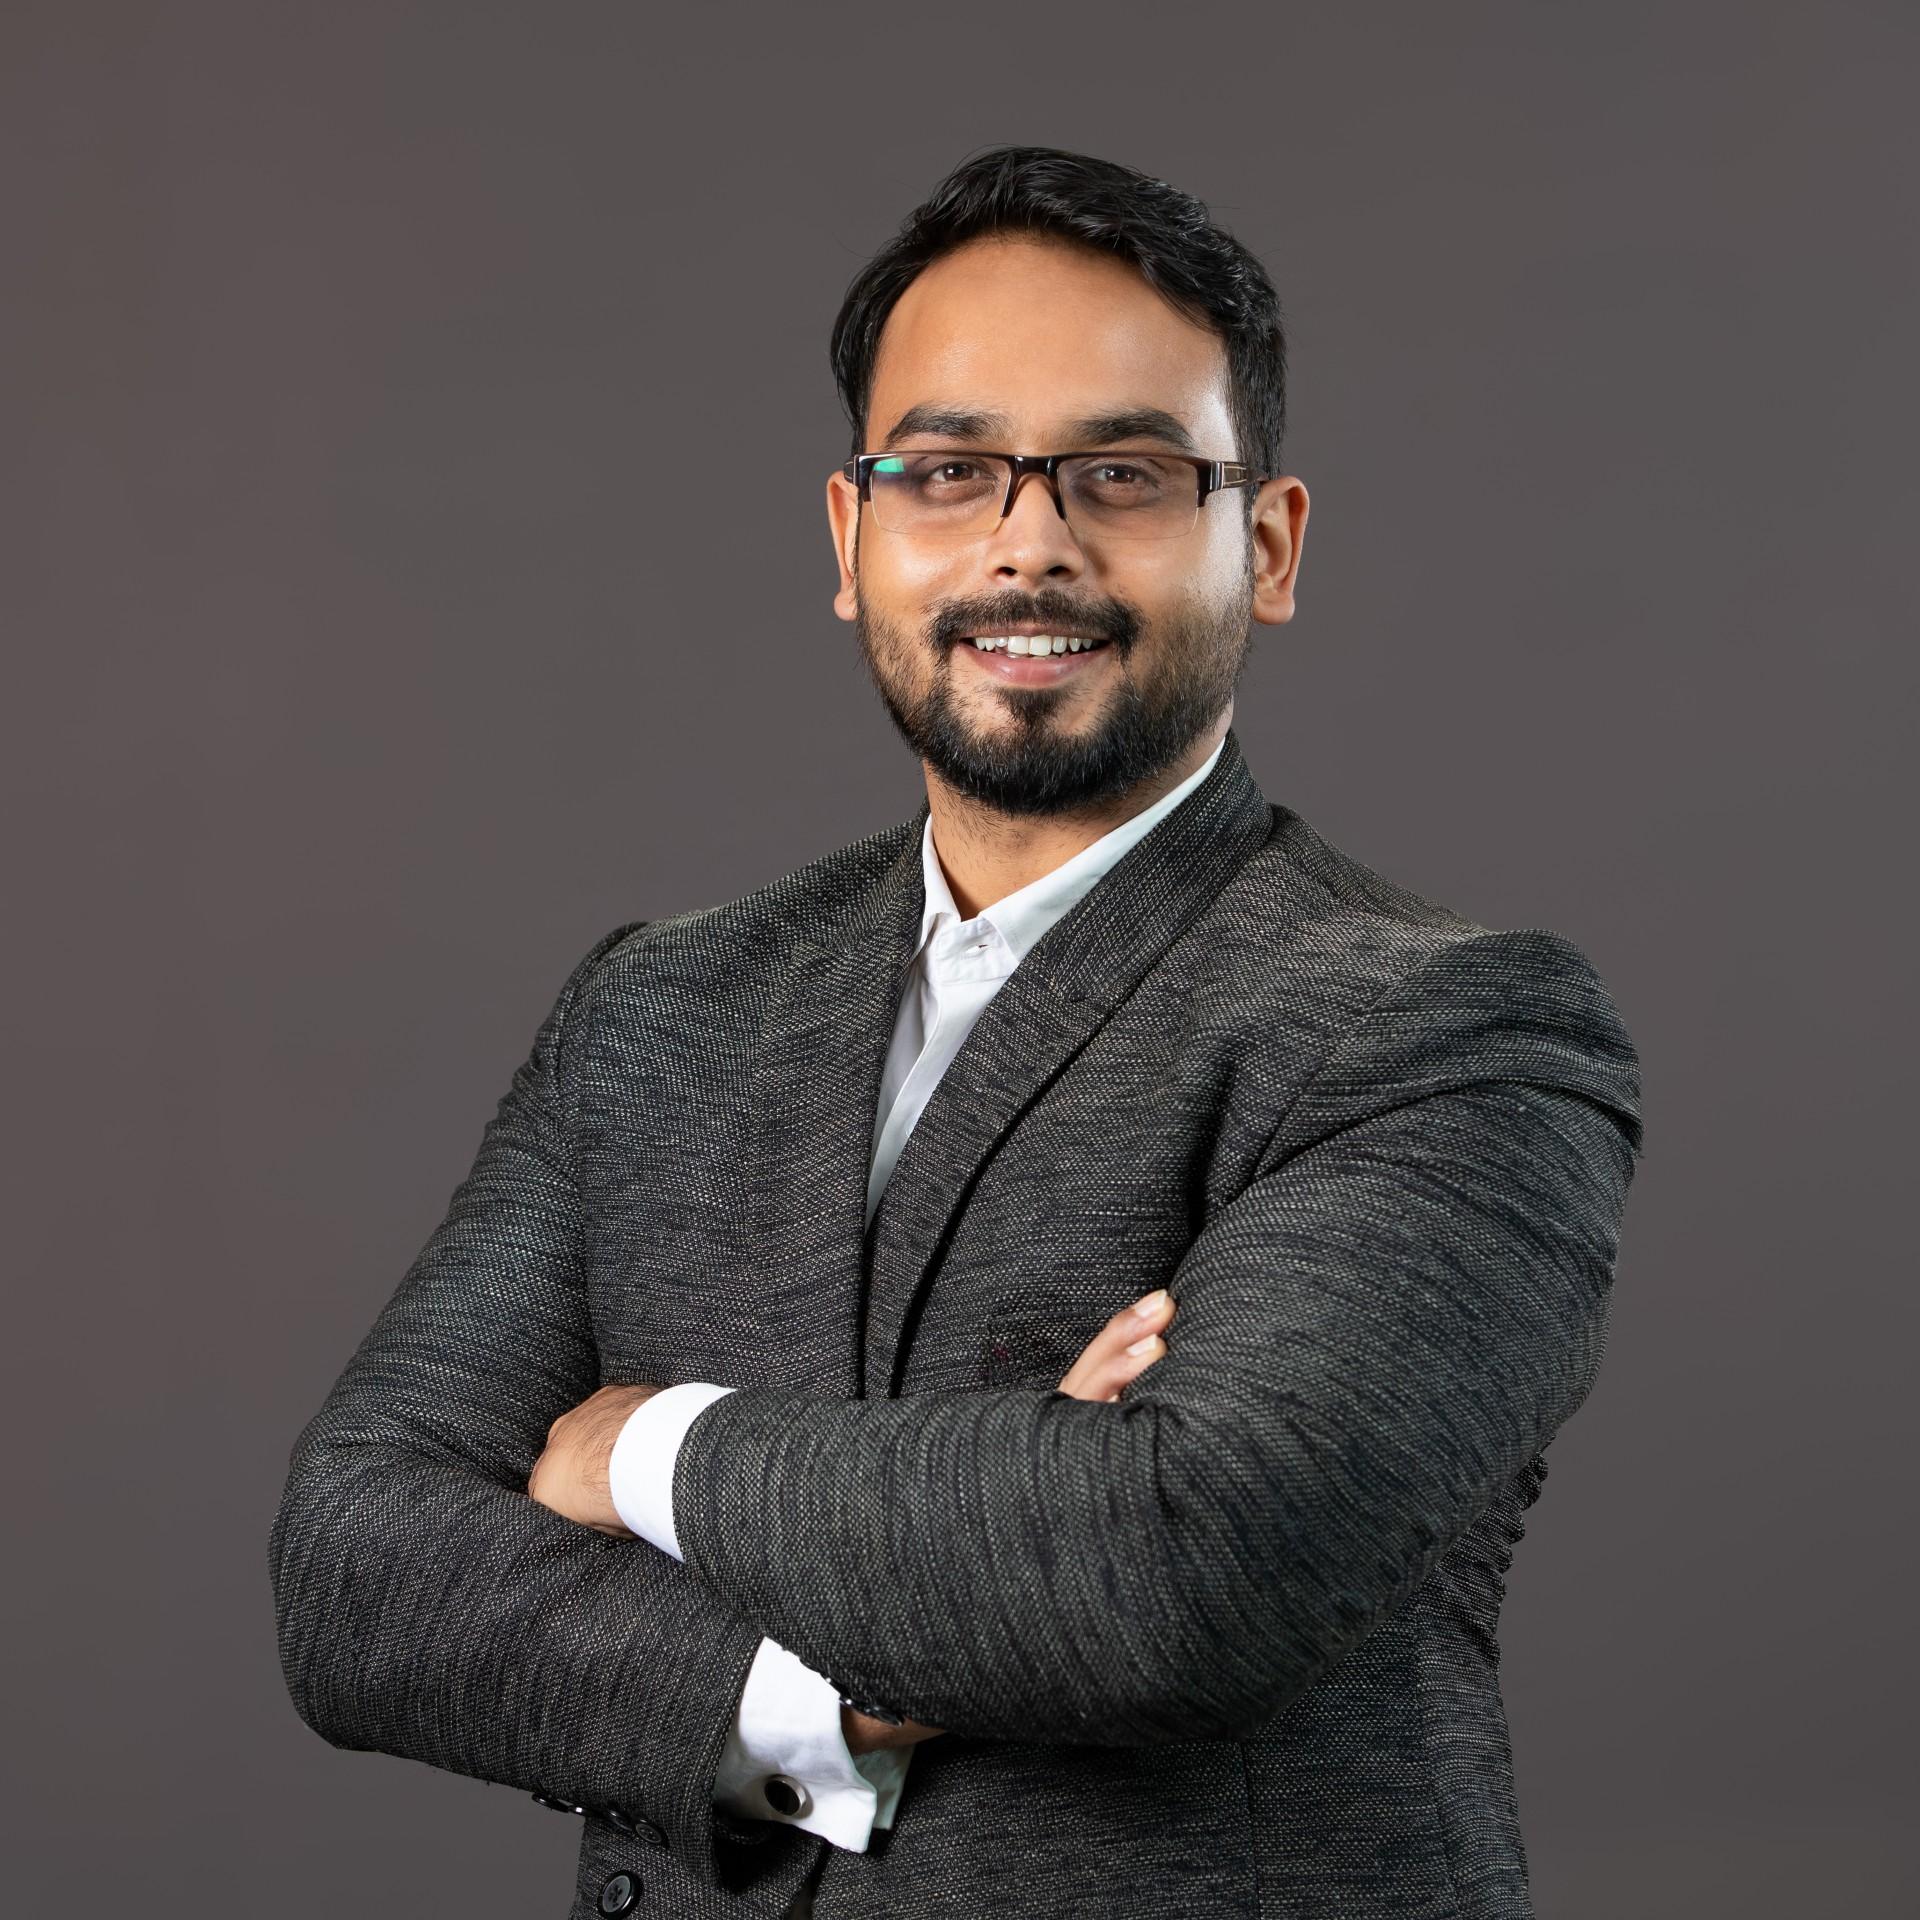 Mohammed Evan, Coordinator, NSU Startups Next